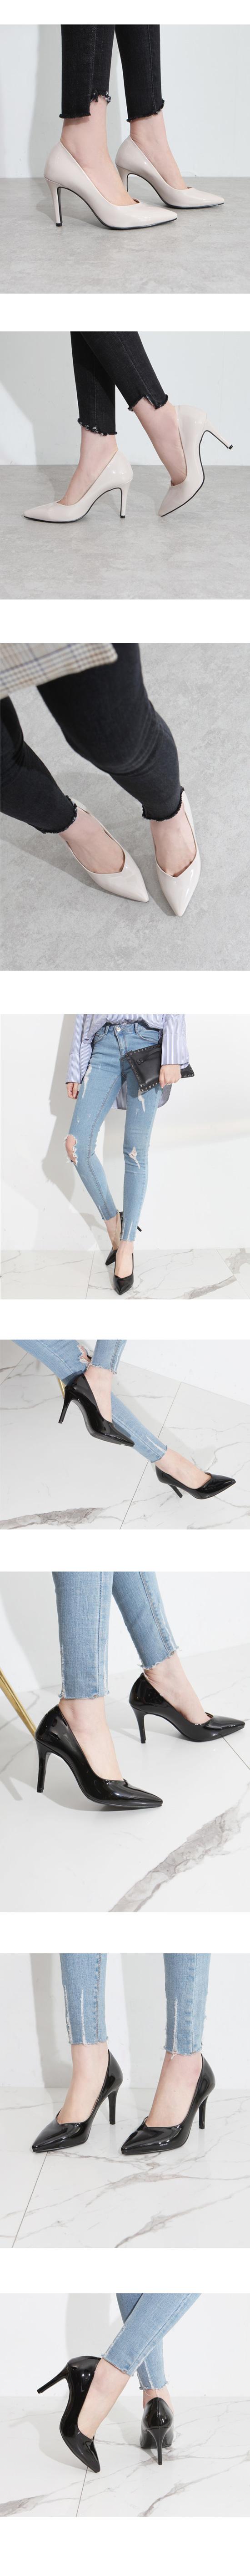 Slim Stiletto High Heel Enamel Beige